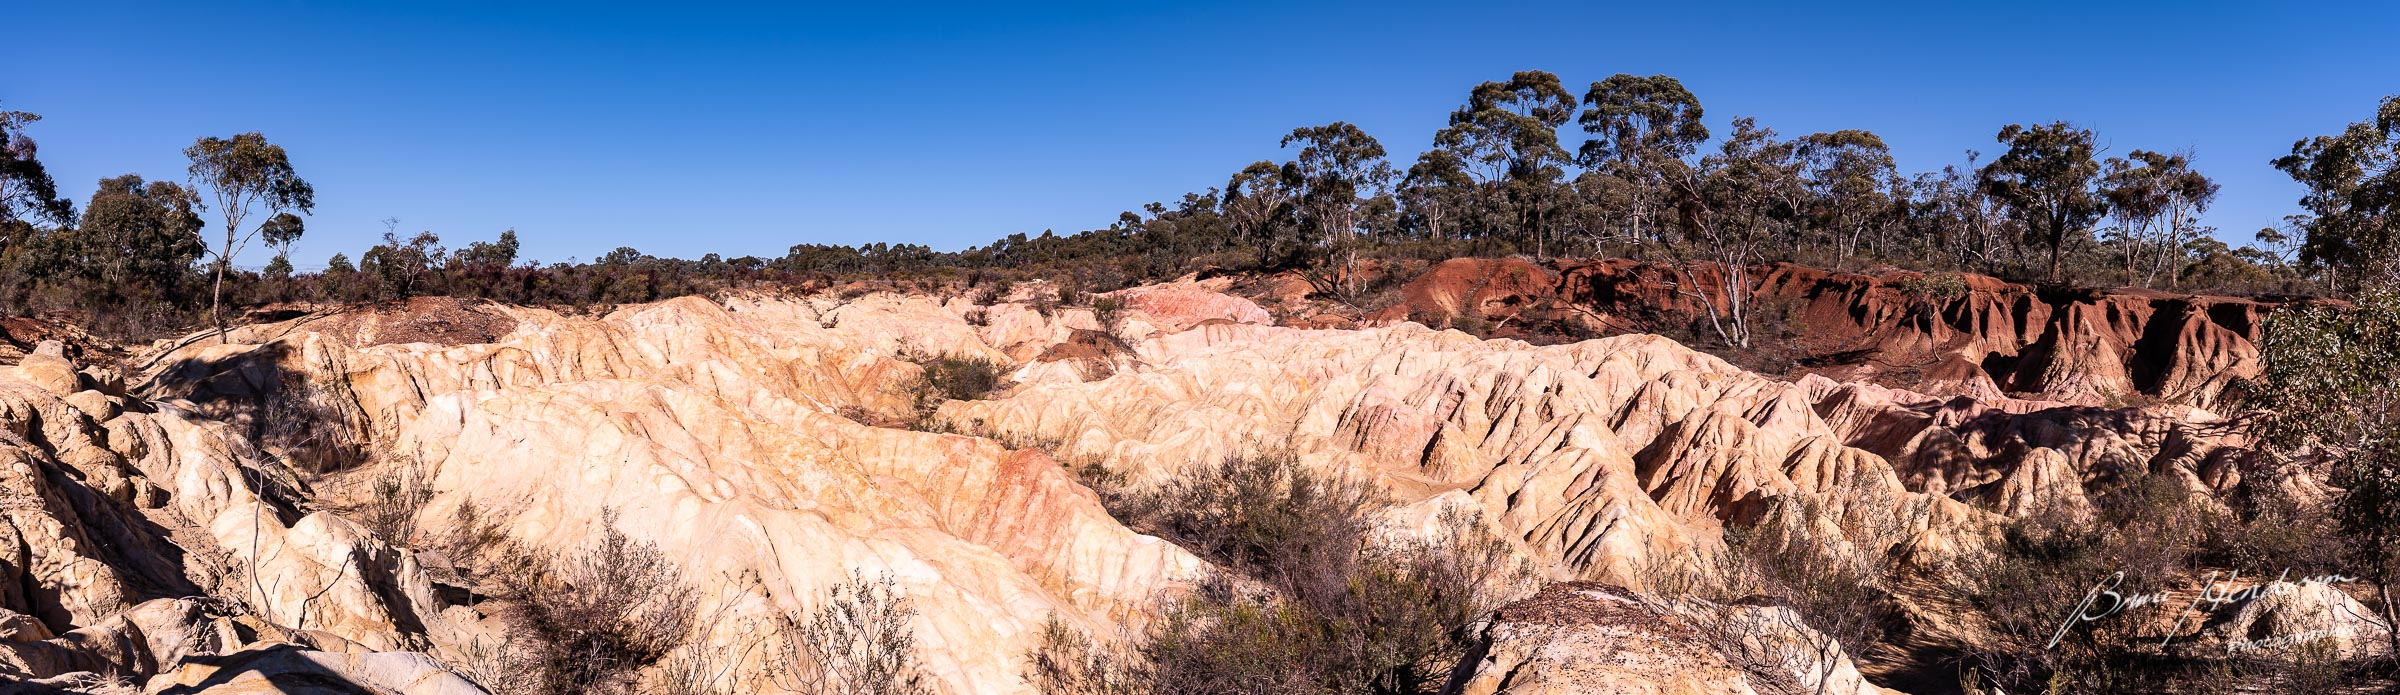 Pink_Cliffs_Heathcote-